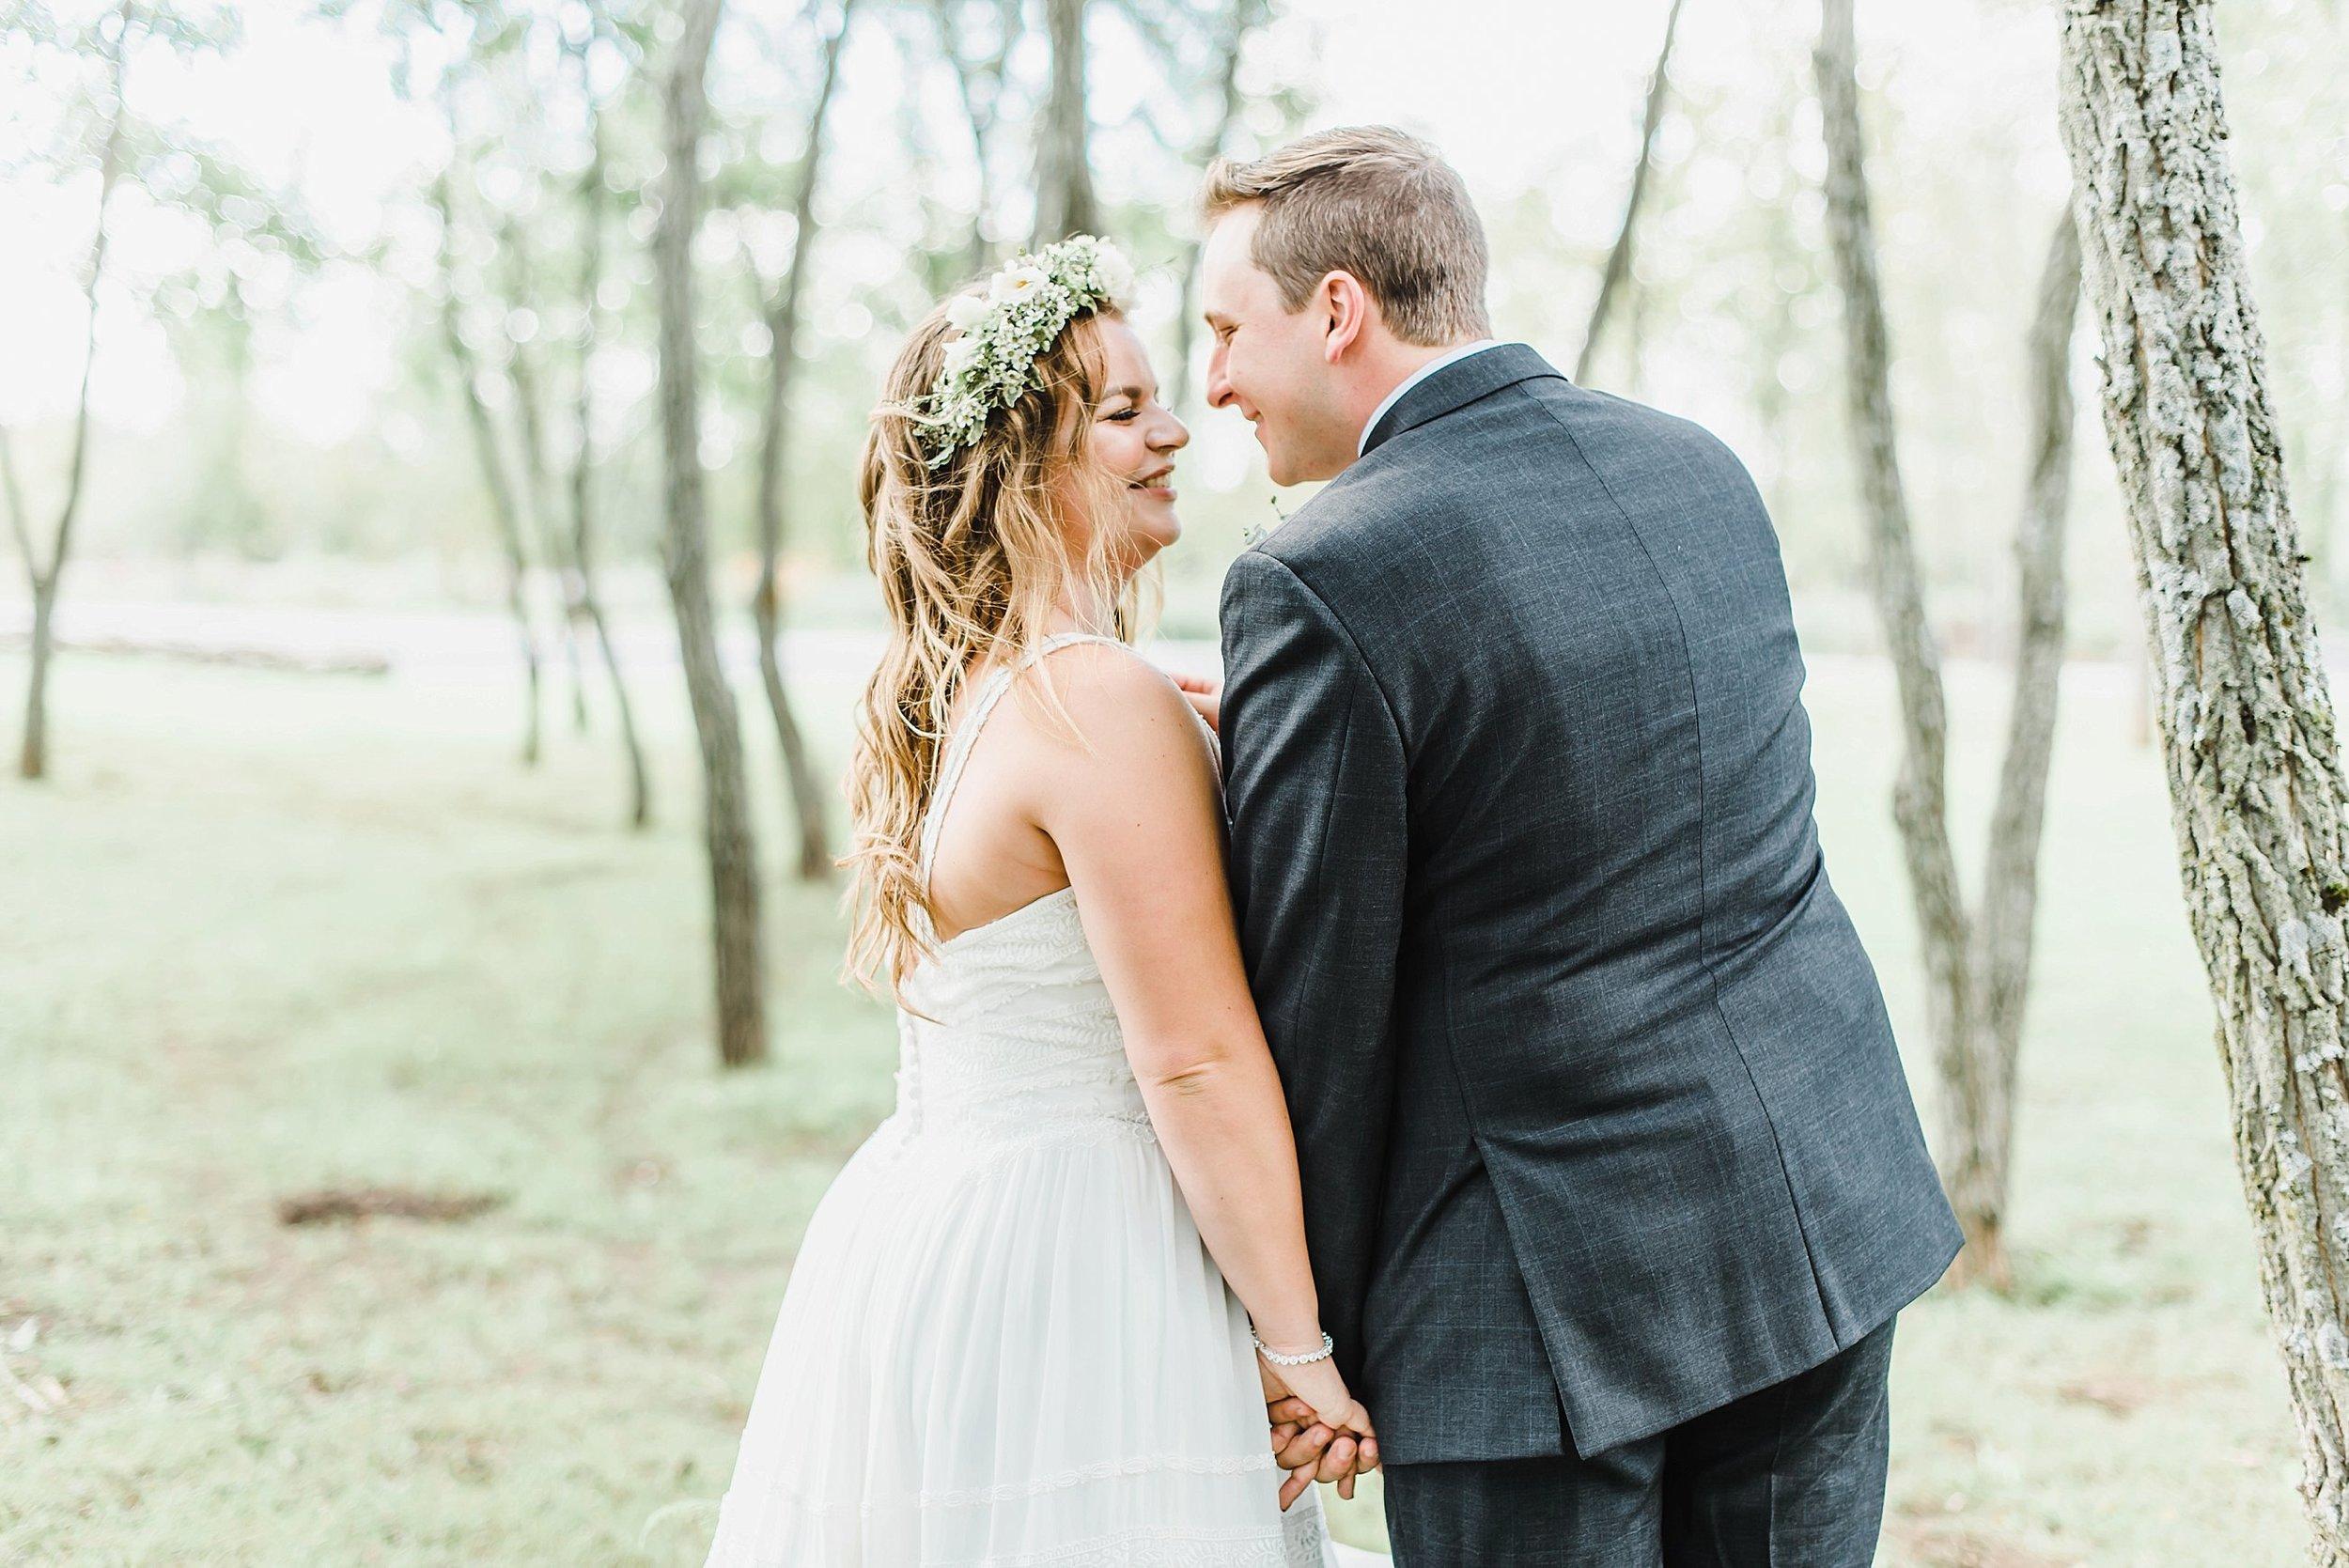 light airy indie fine art ottawa wedding photographer | Ali and Batoul Photography_1098.jpg